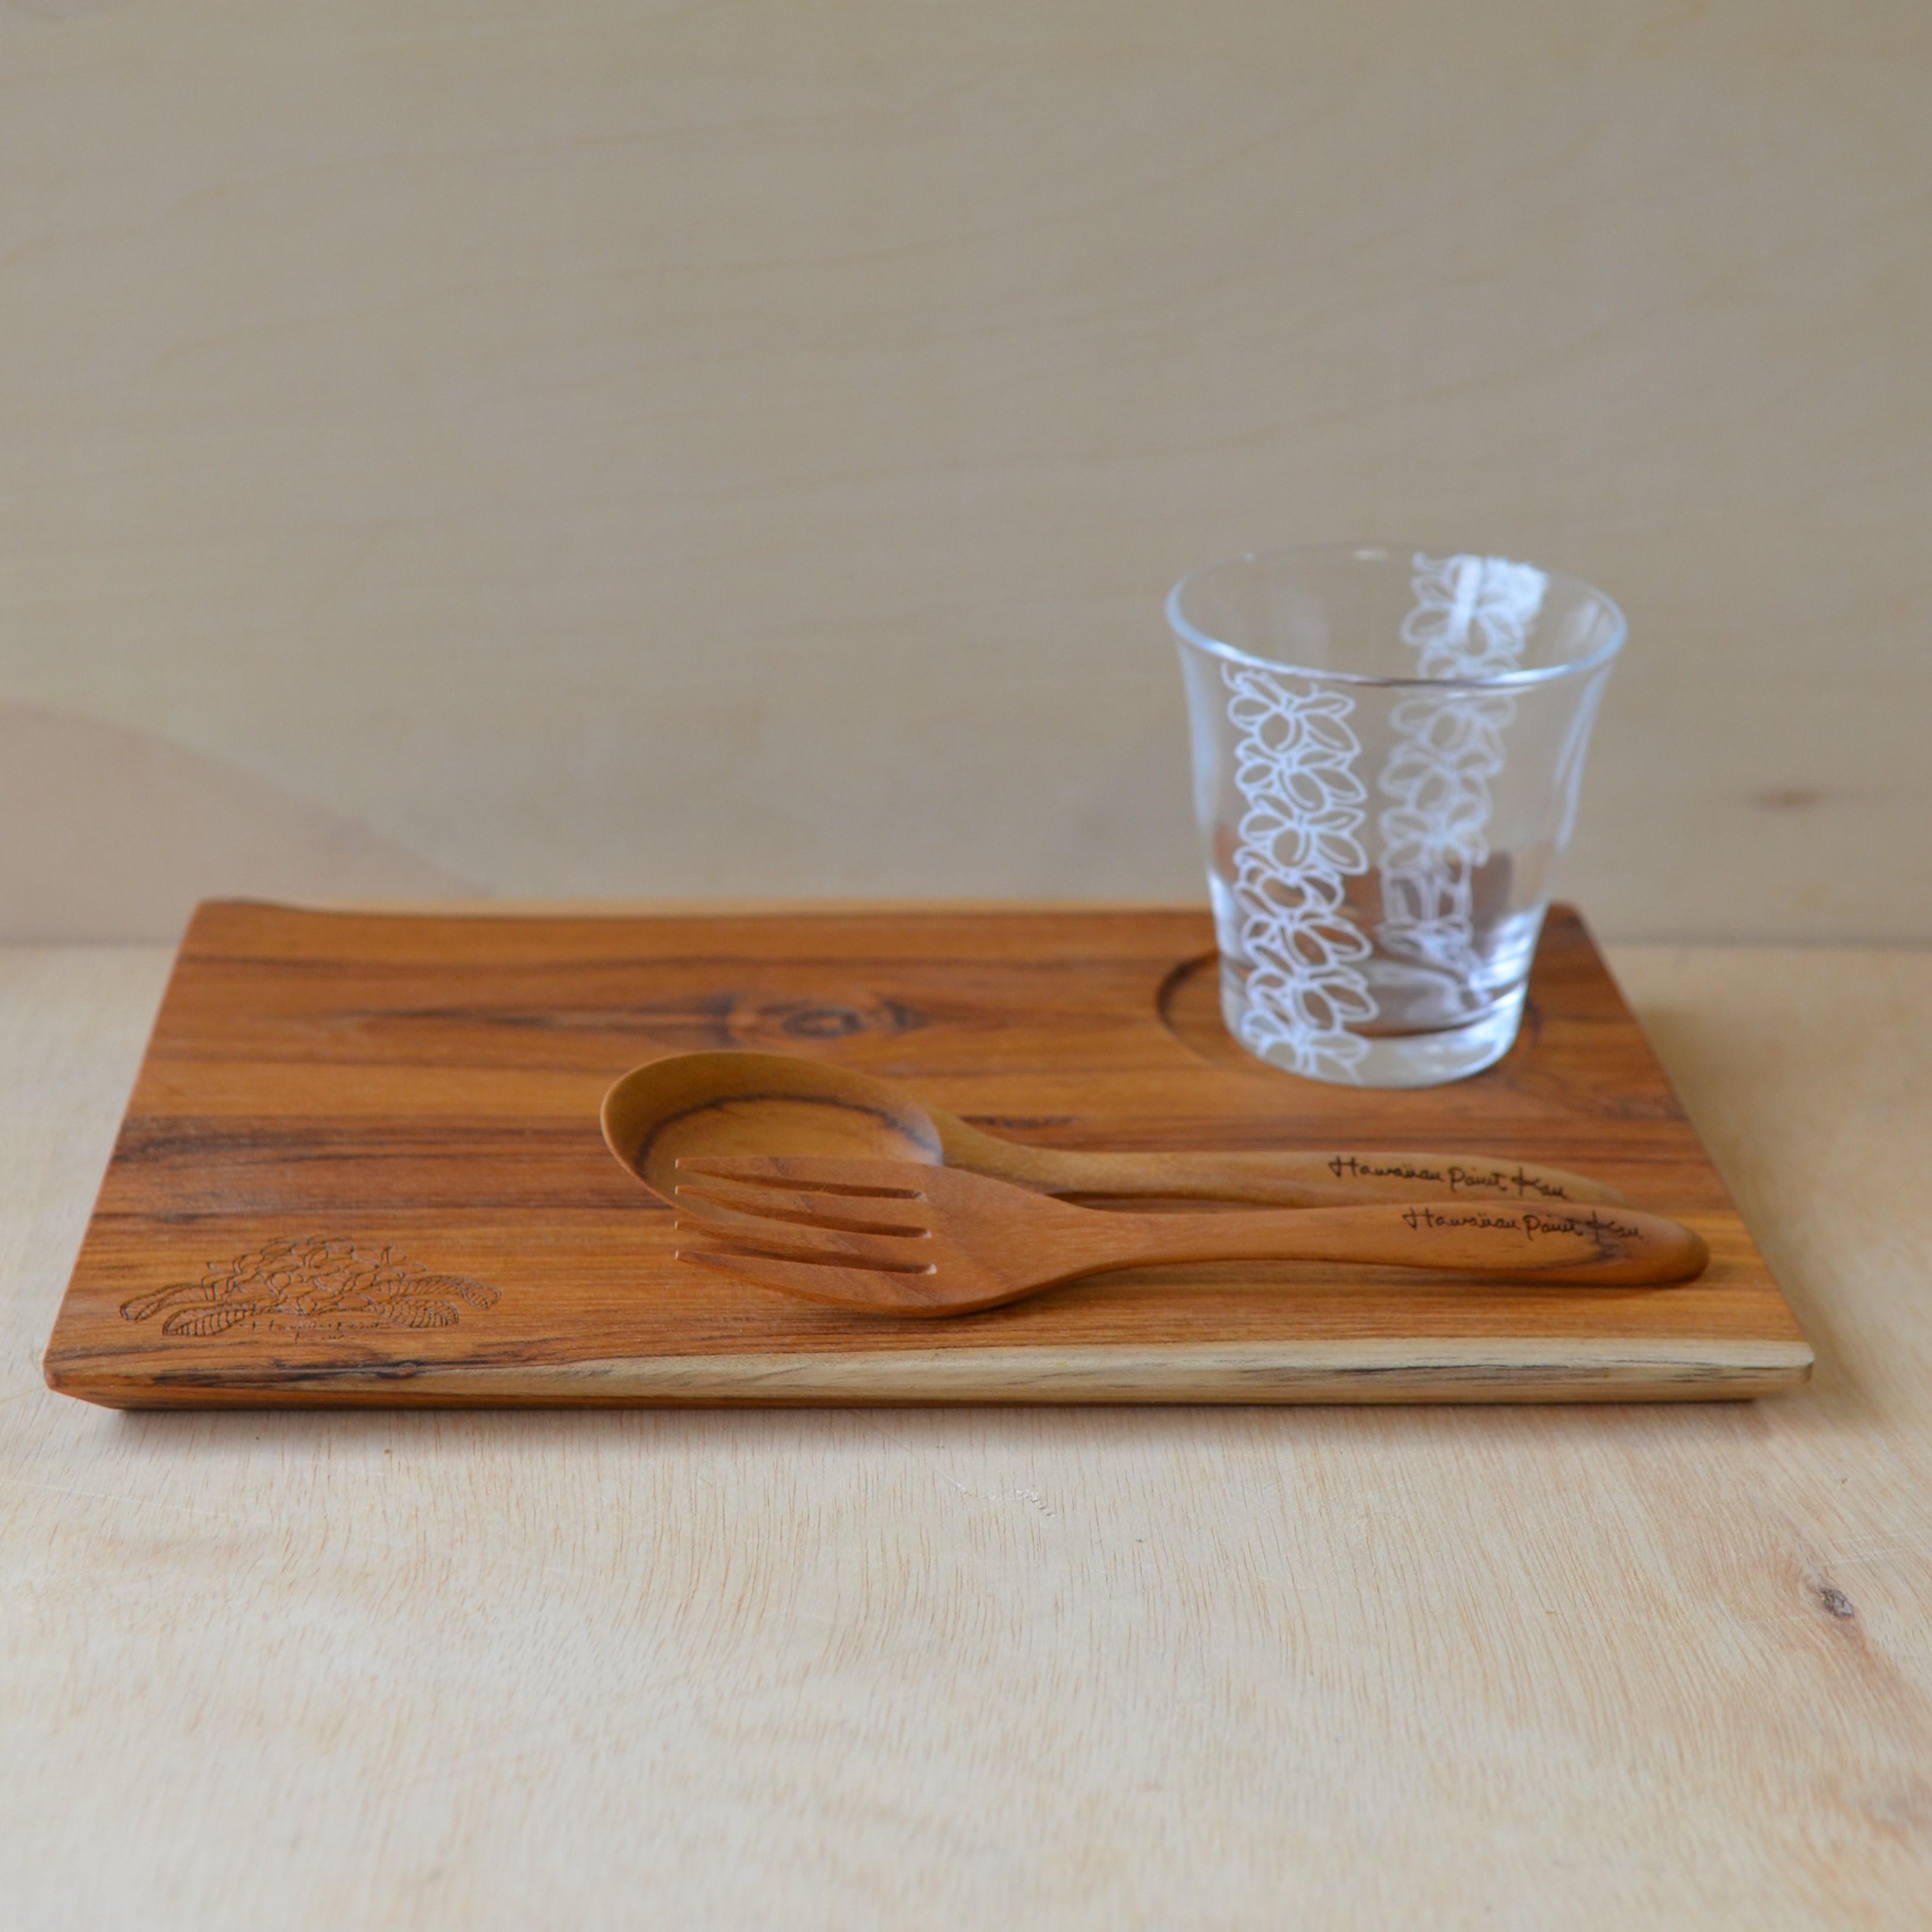 Wood Gift set L (Wood plate L / Wood spoon&fork / Glass)